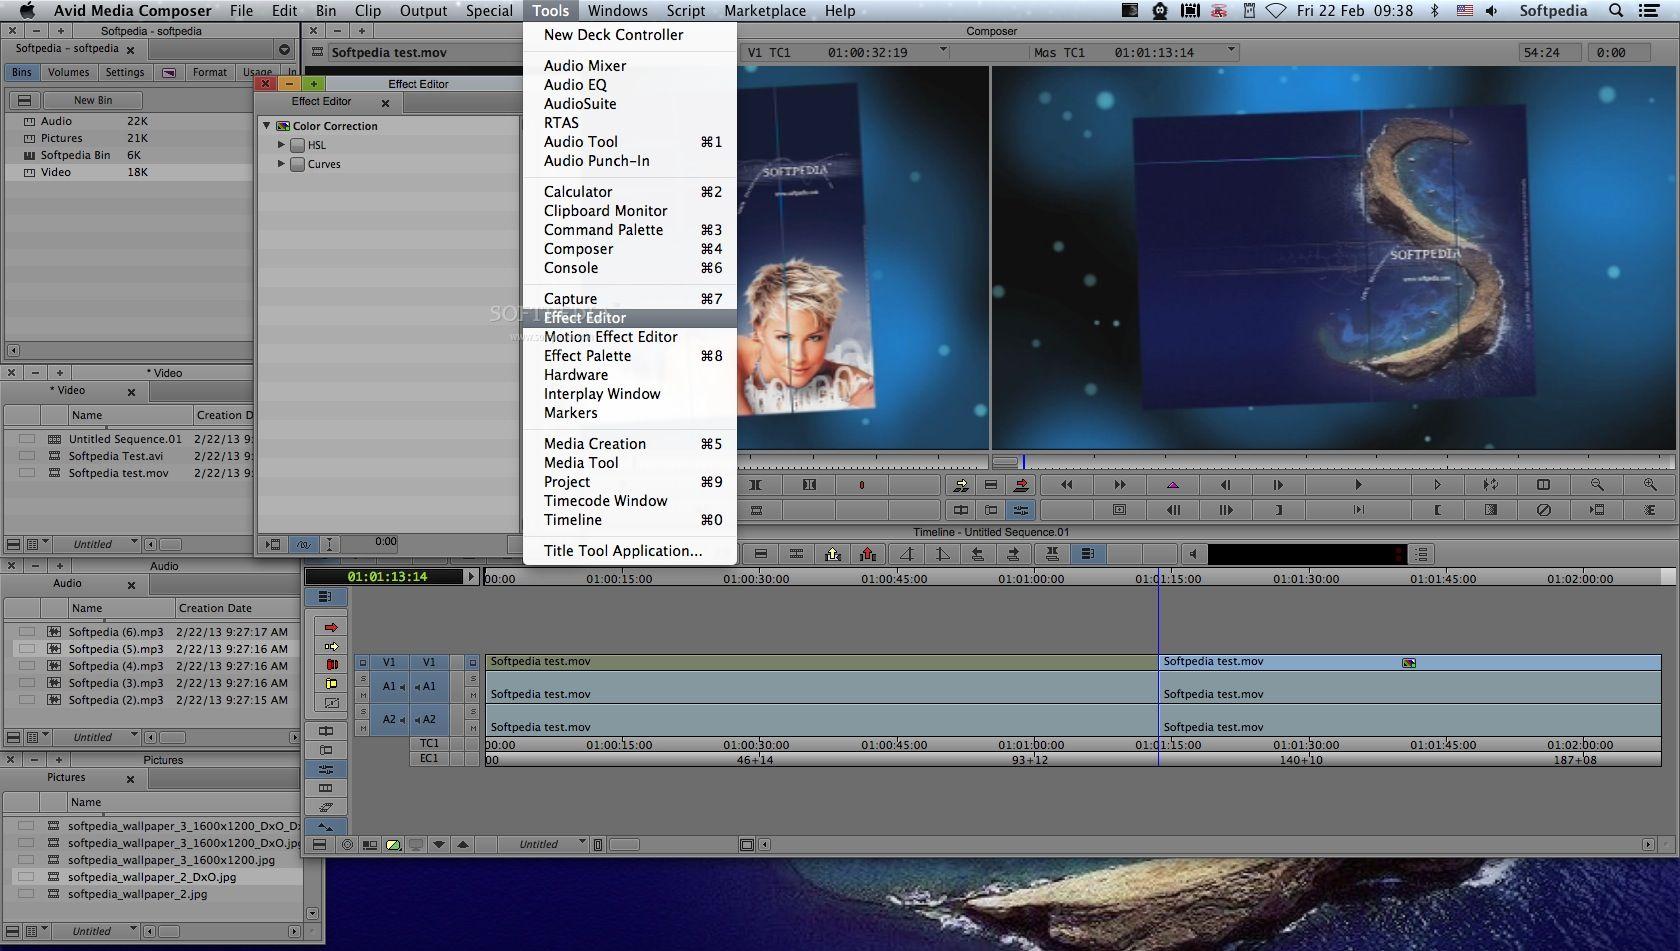 avid media composer for windows 7 free download